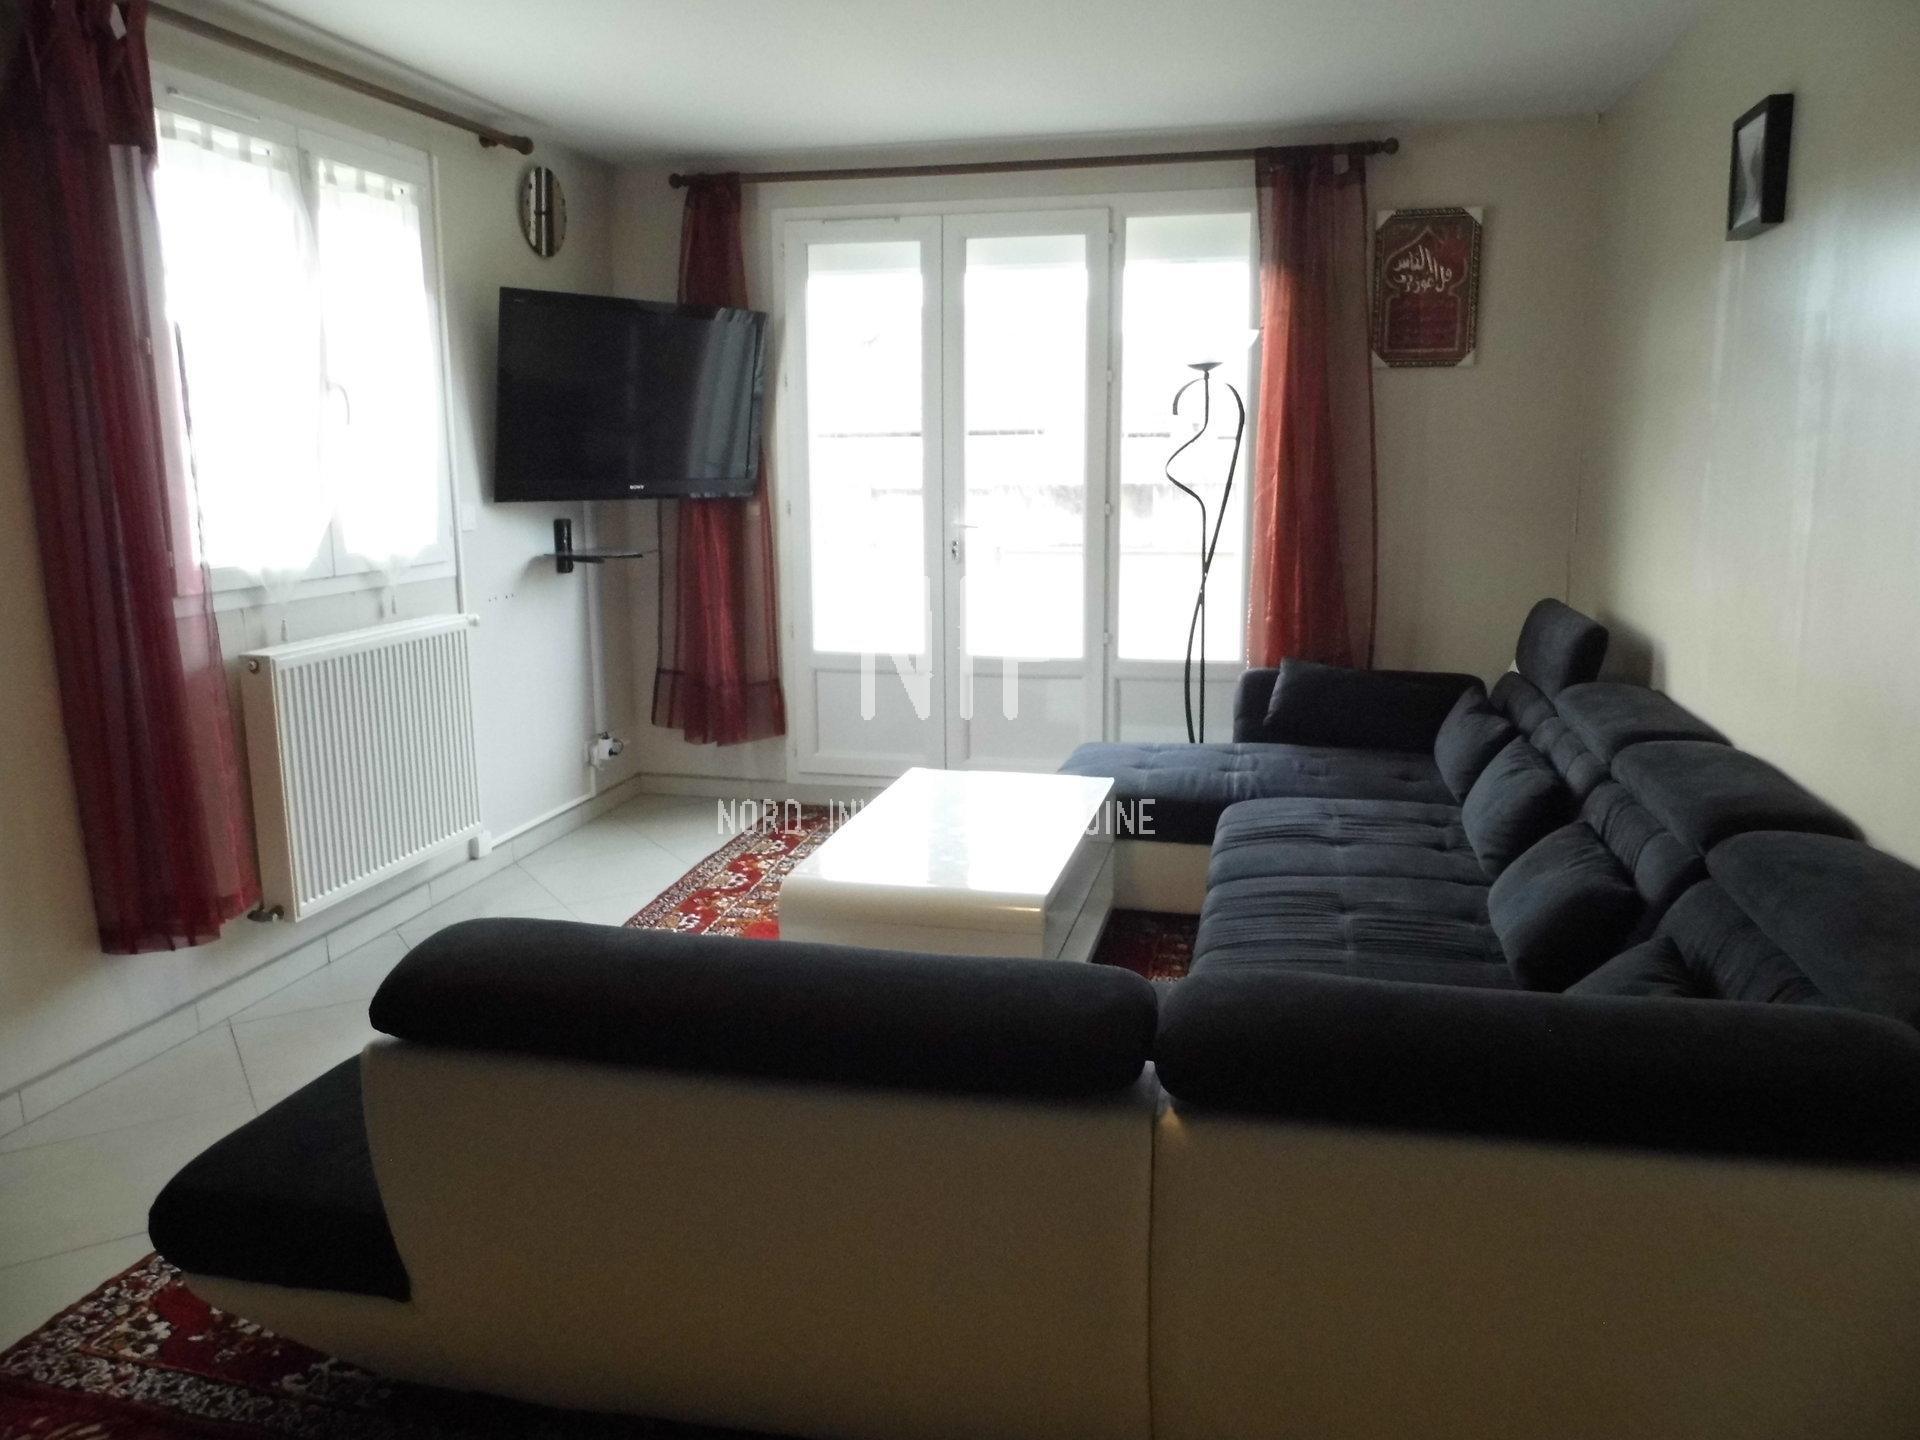 Vendita Duplex - Lys Lez Lannoy